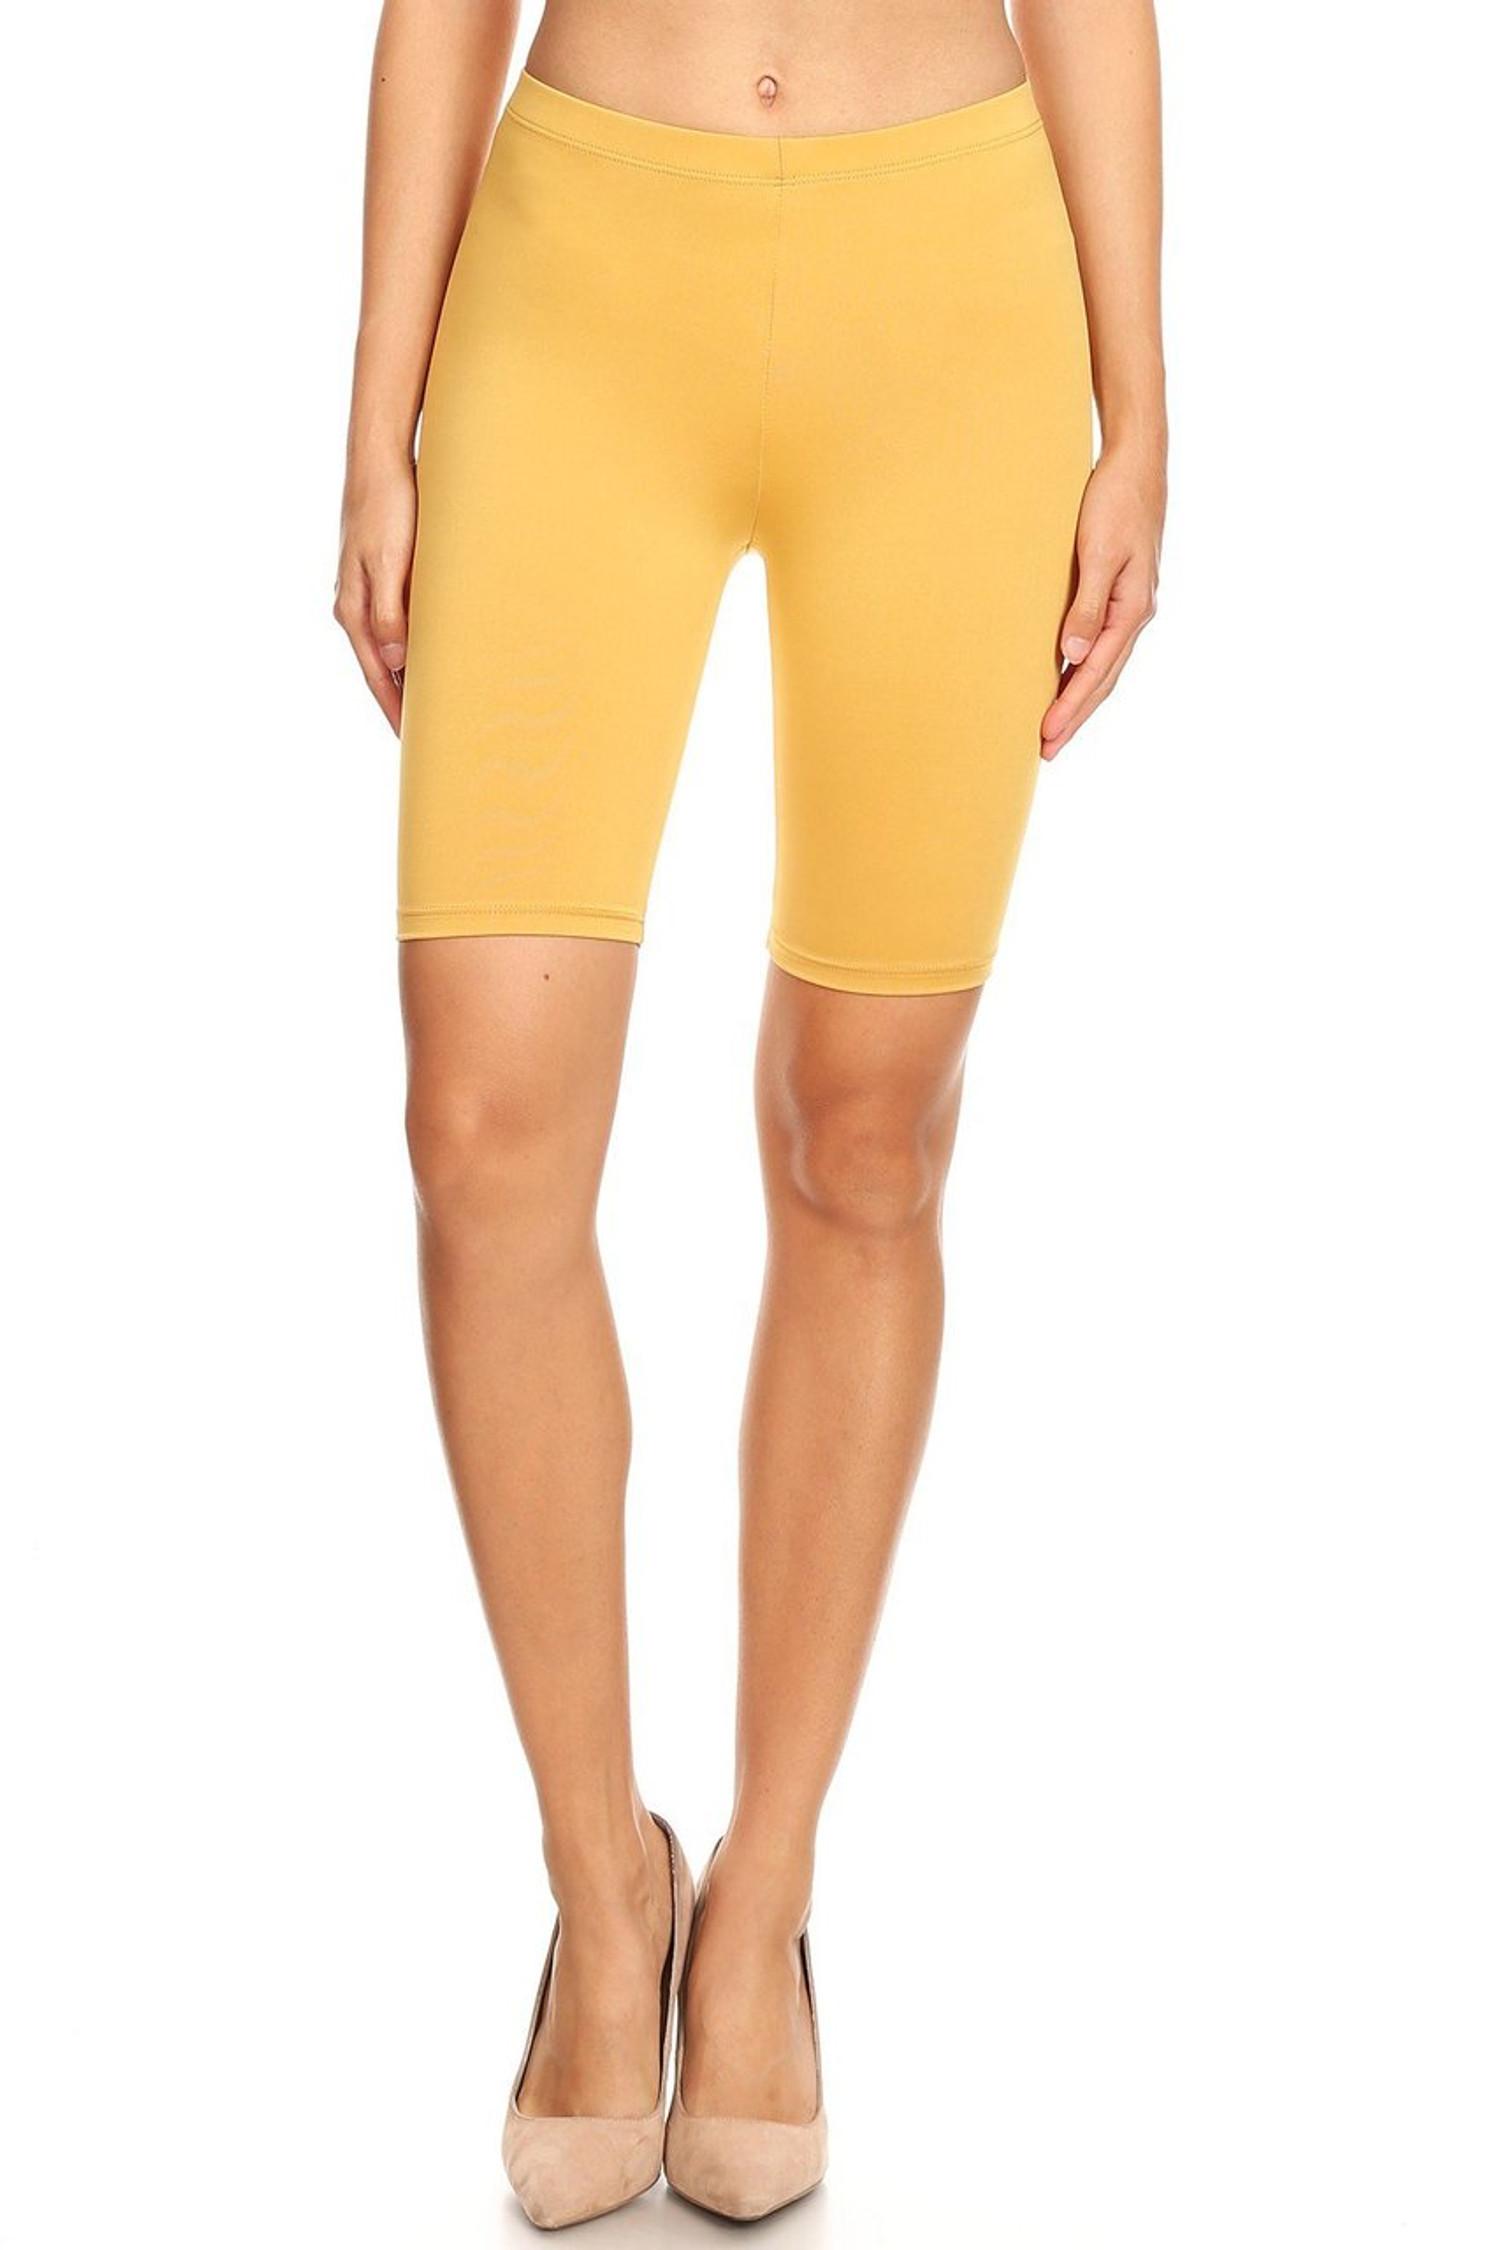 USA Basic Sport Shorts